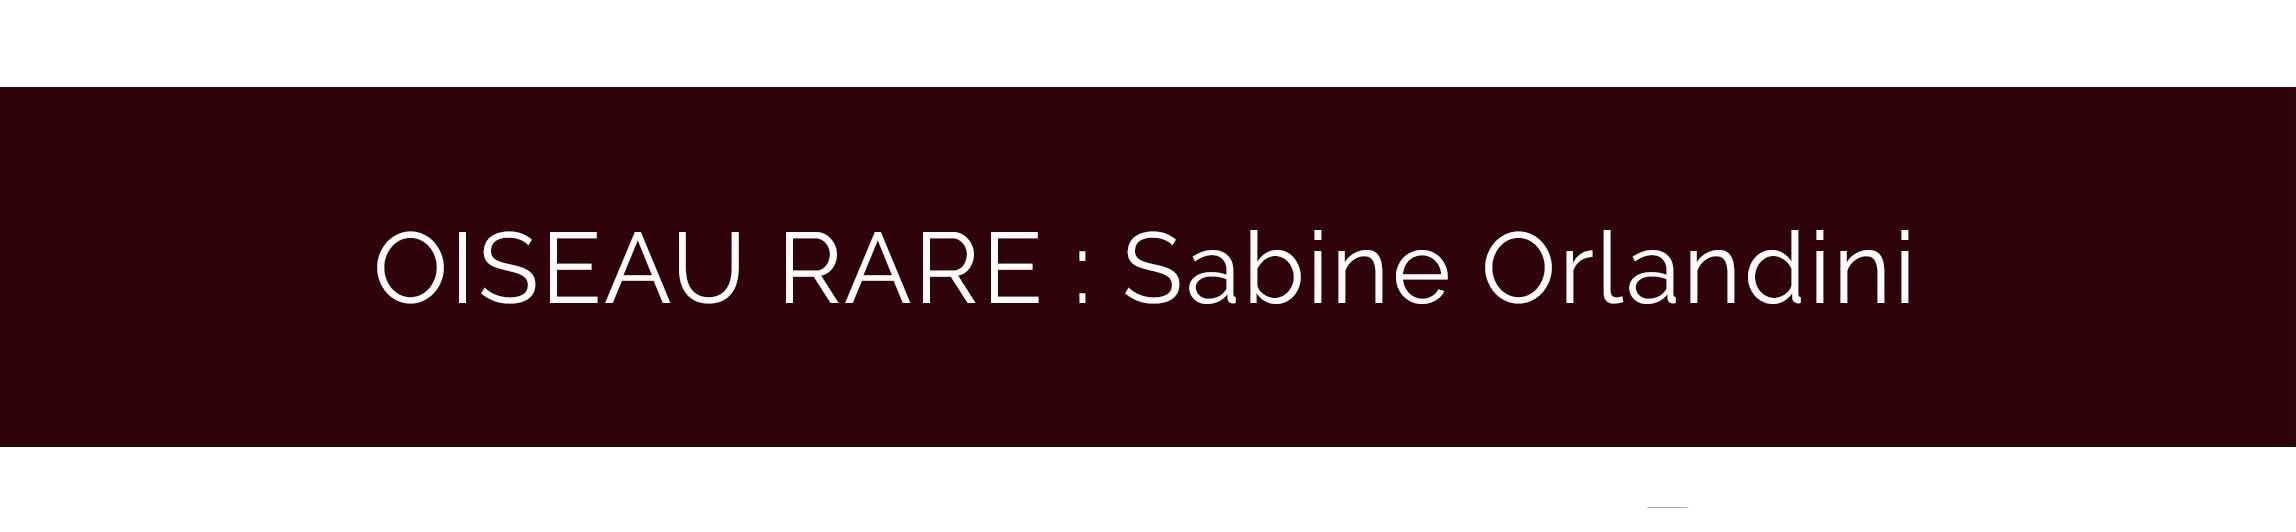 bandeau-artisan-sabien-orlandini